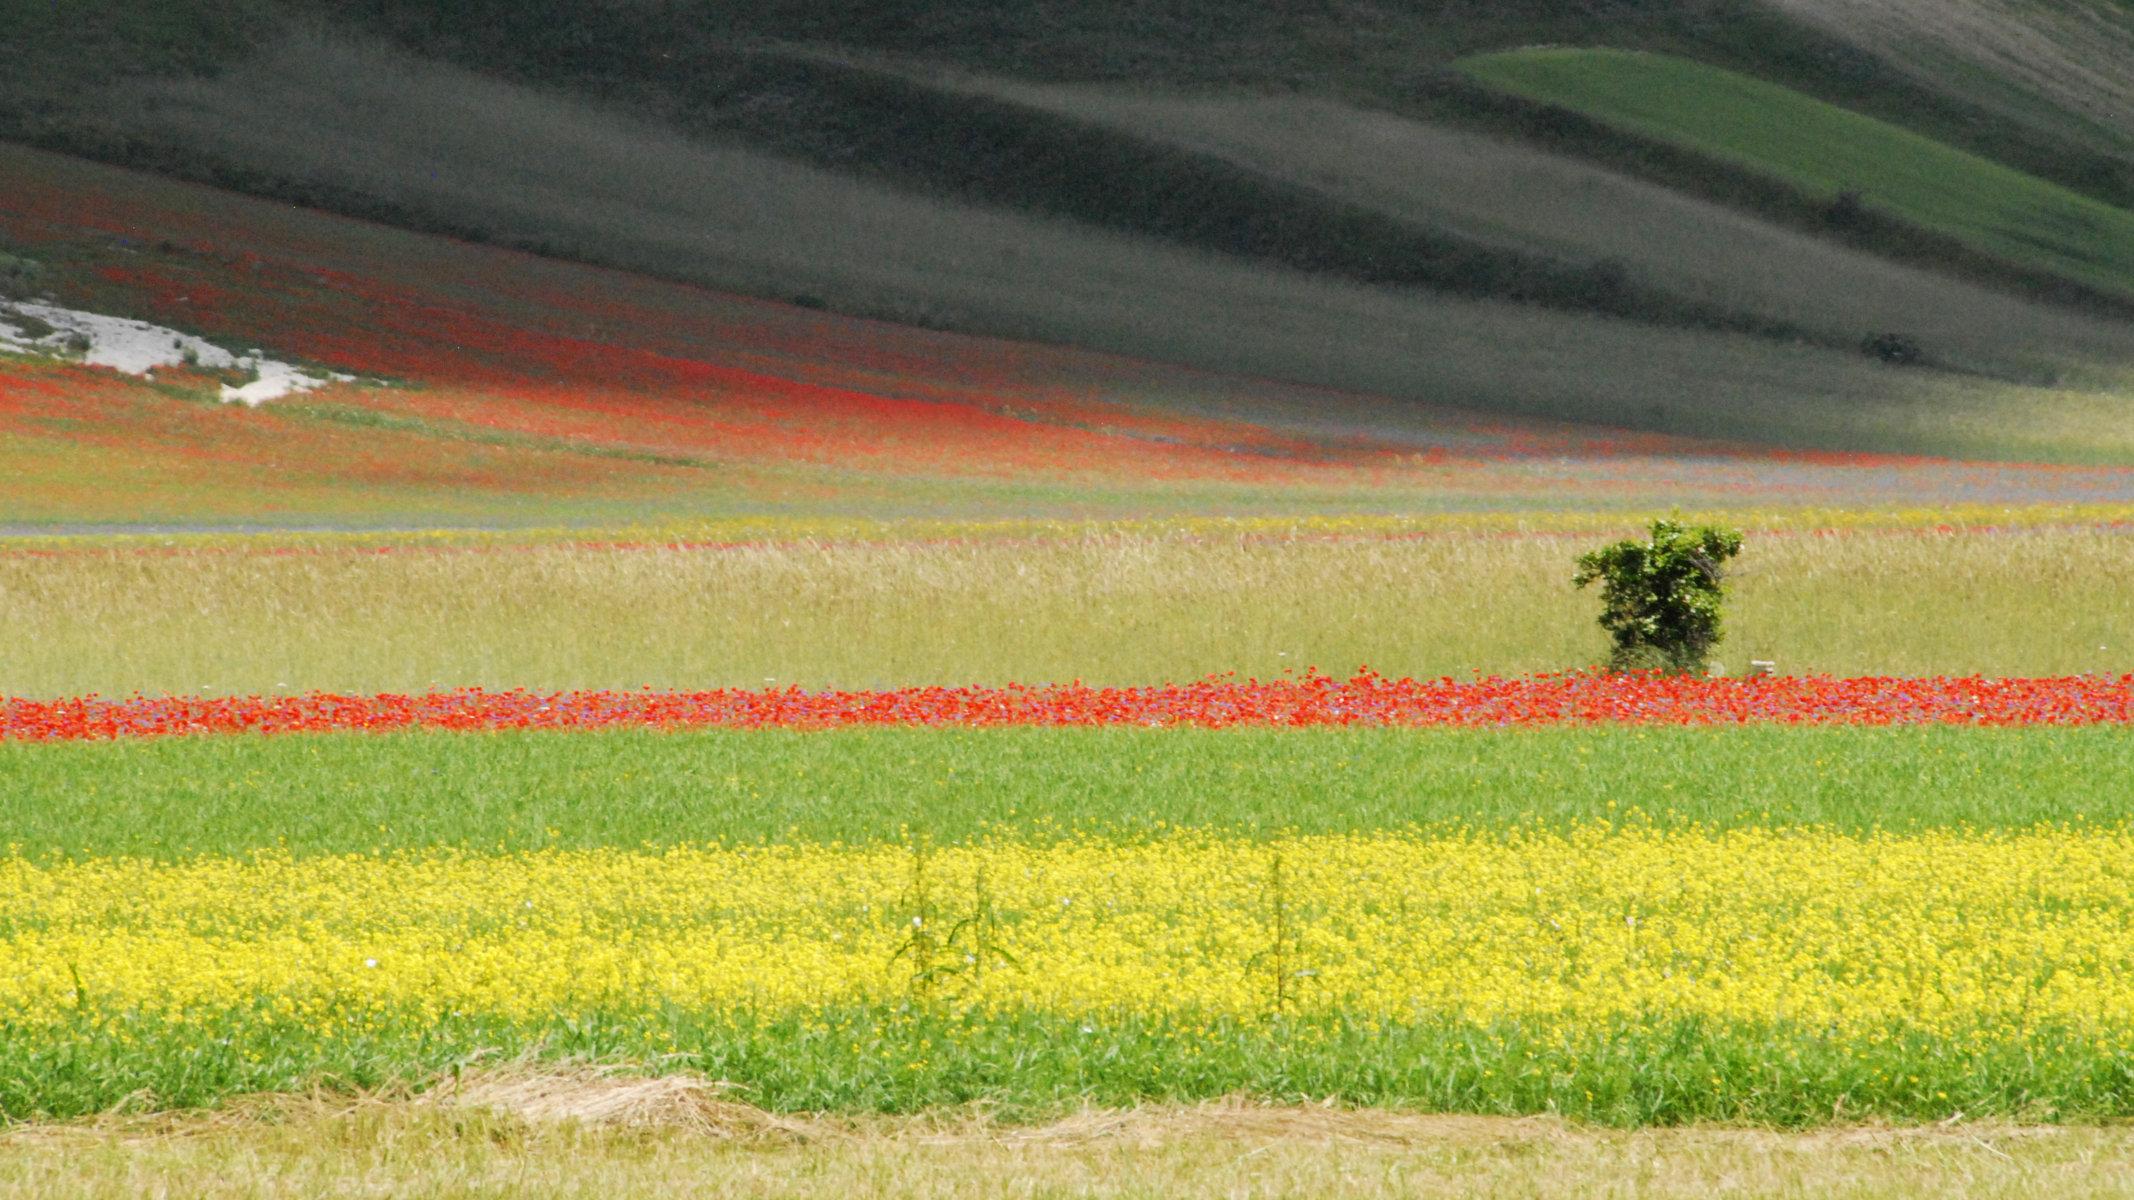 2014-la-fiorita-1a-786c-fileminimizer